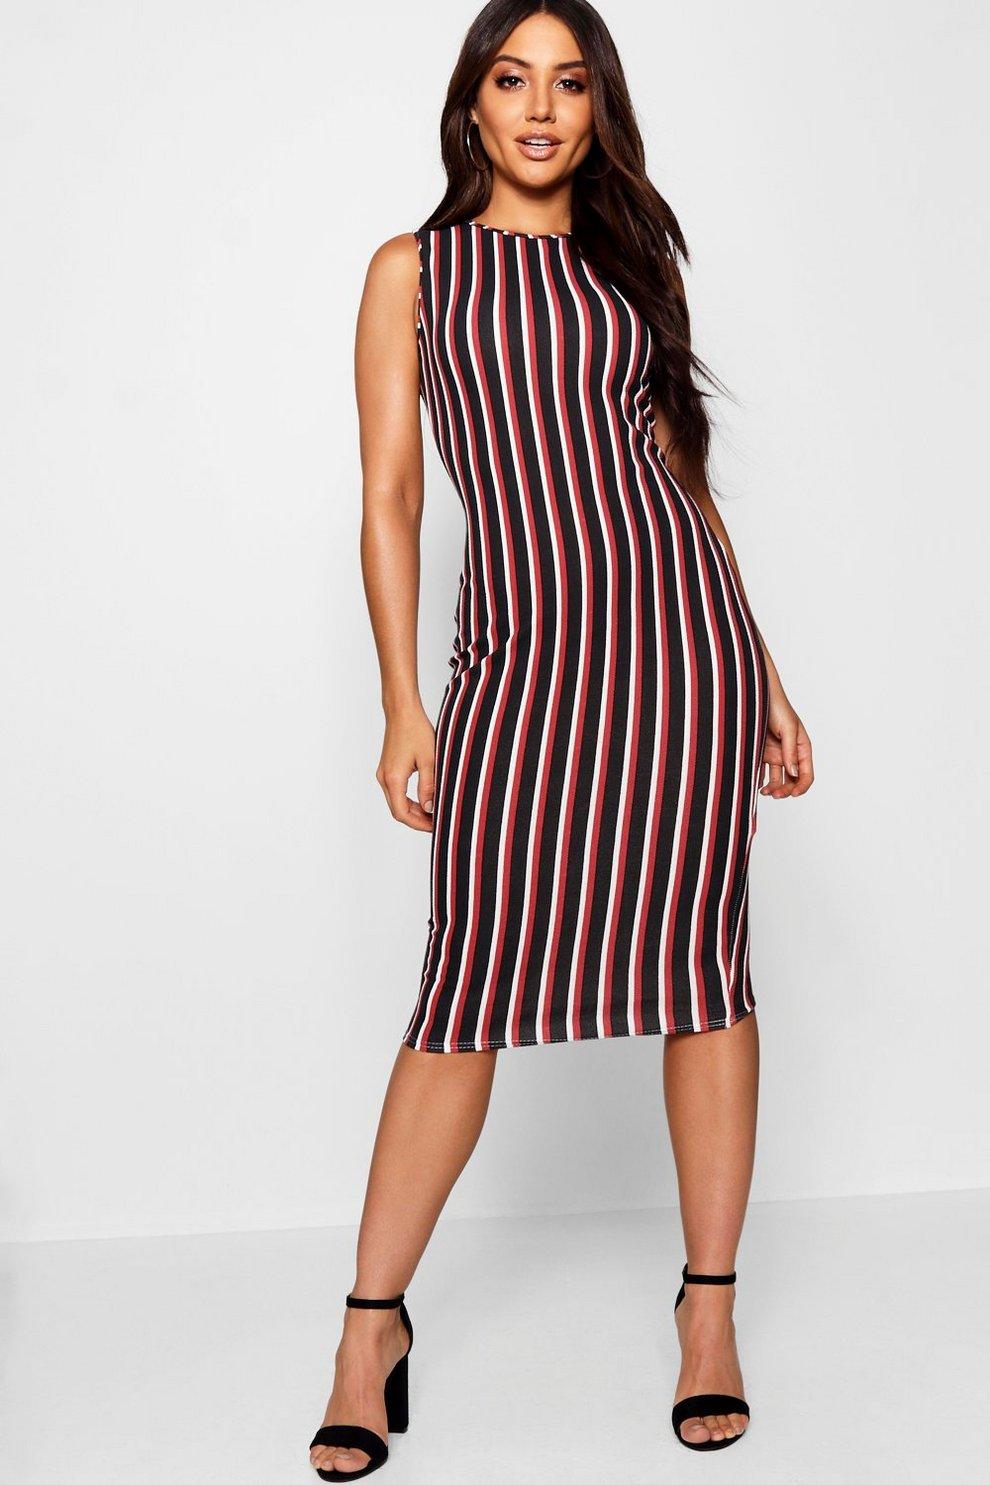 Nautical Stripe Round Neck Midi Dress Boohoo